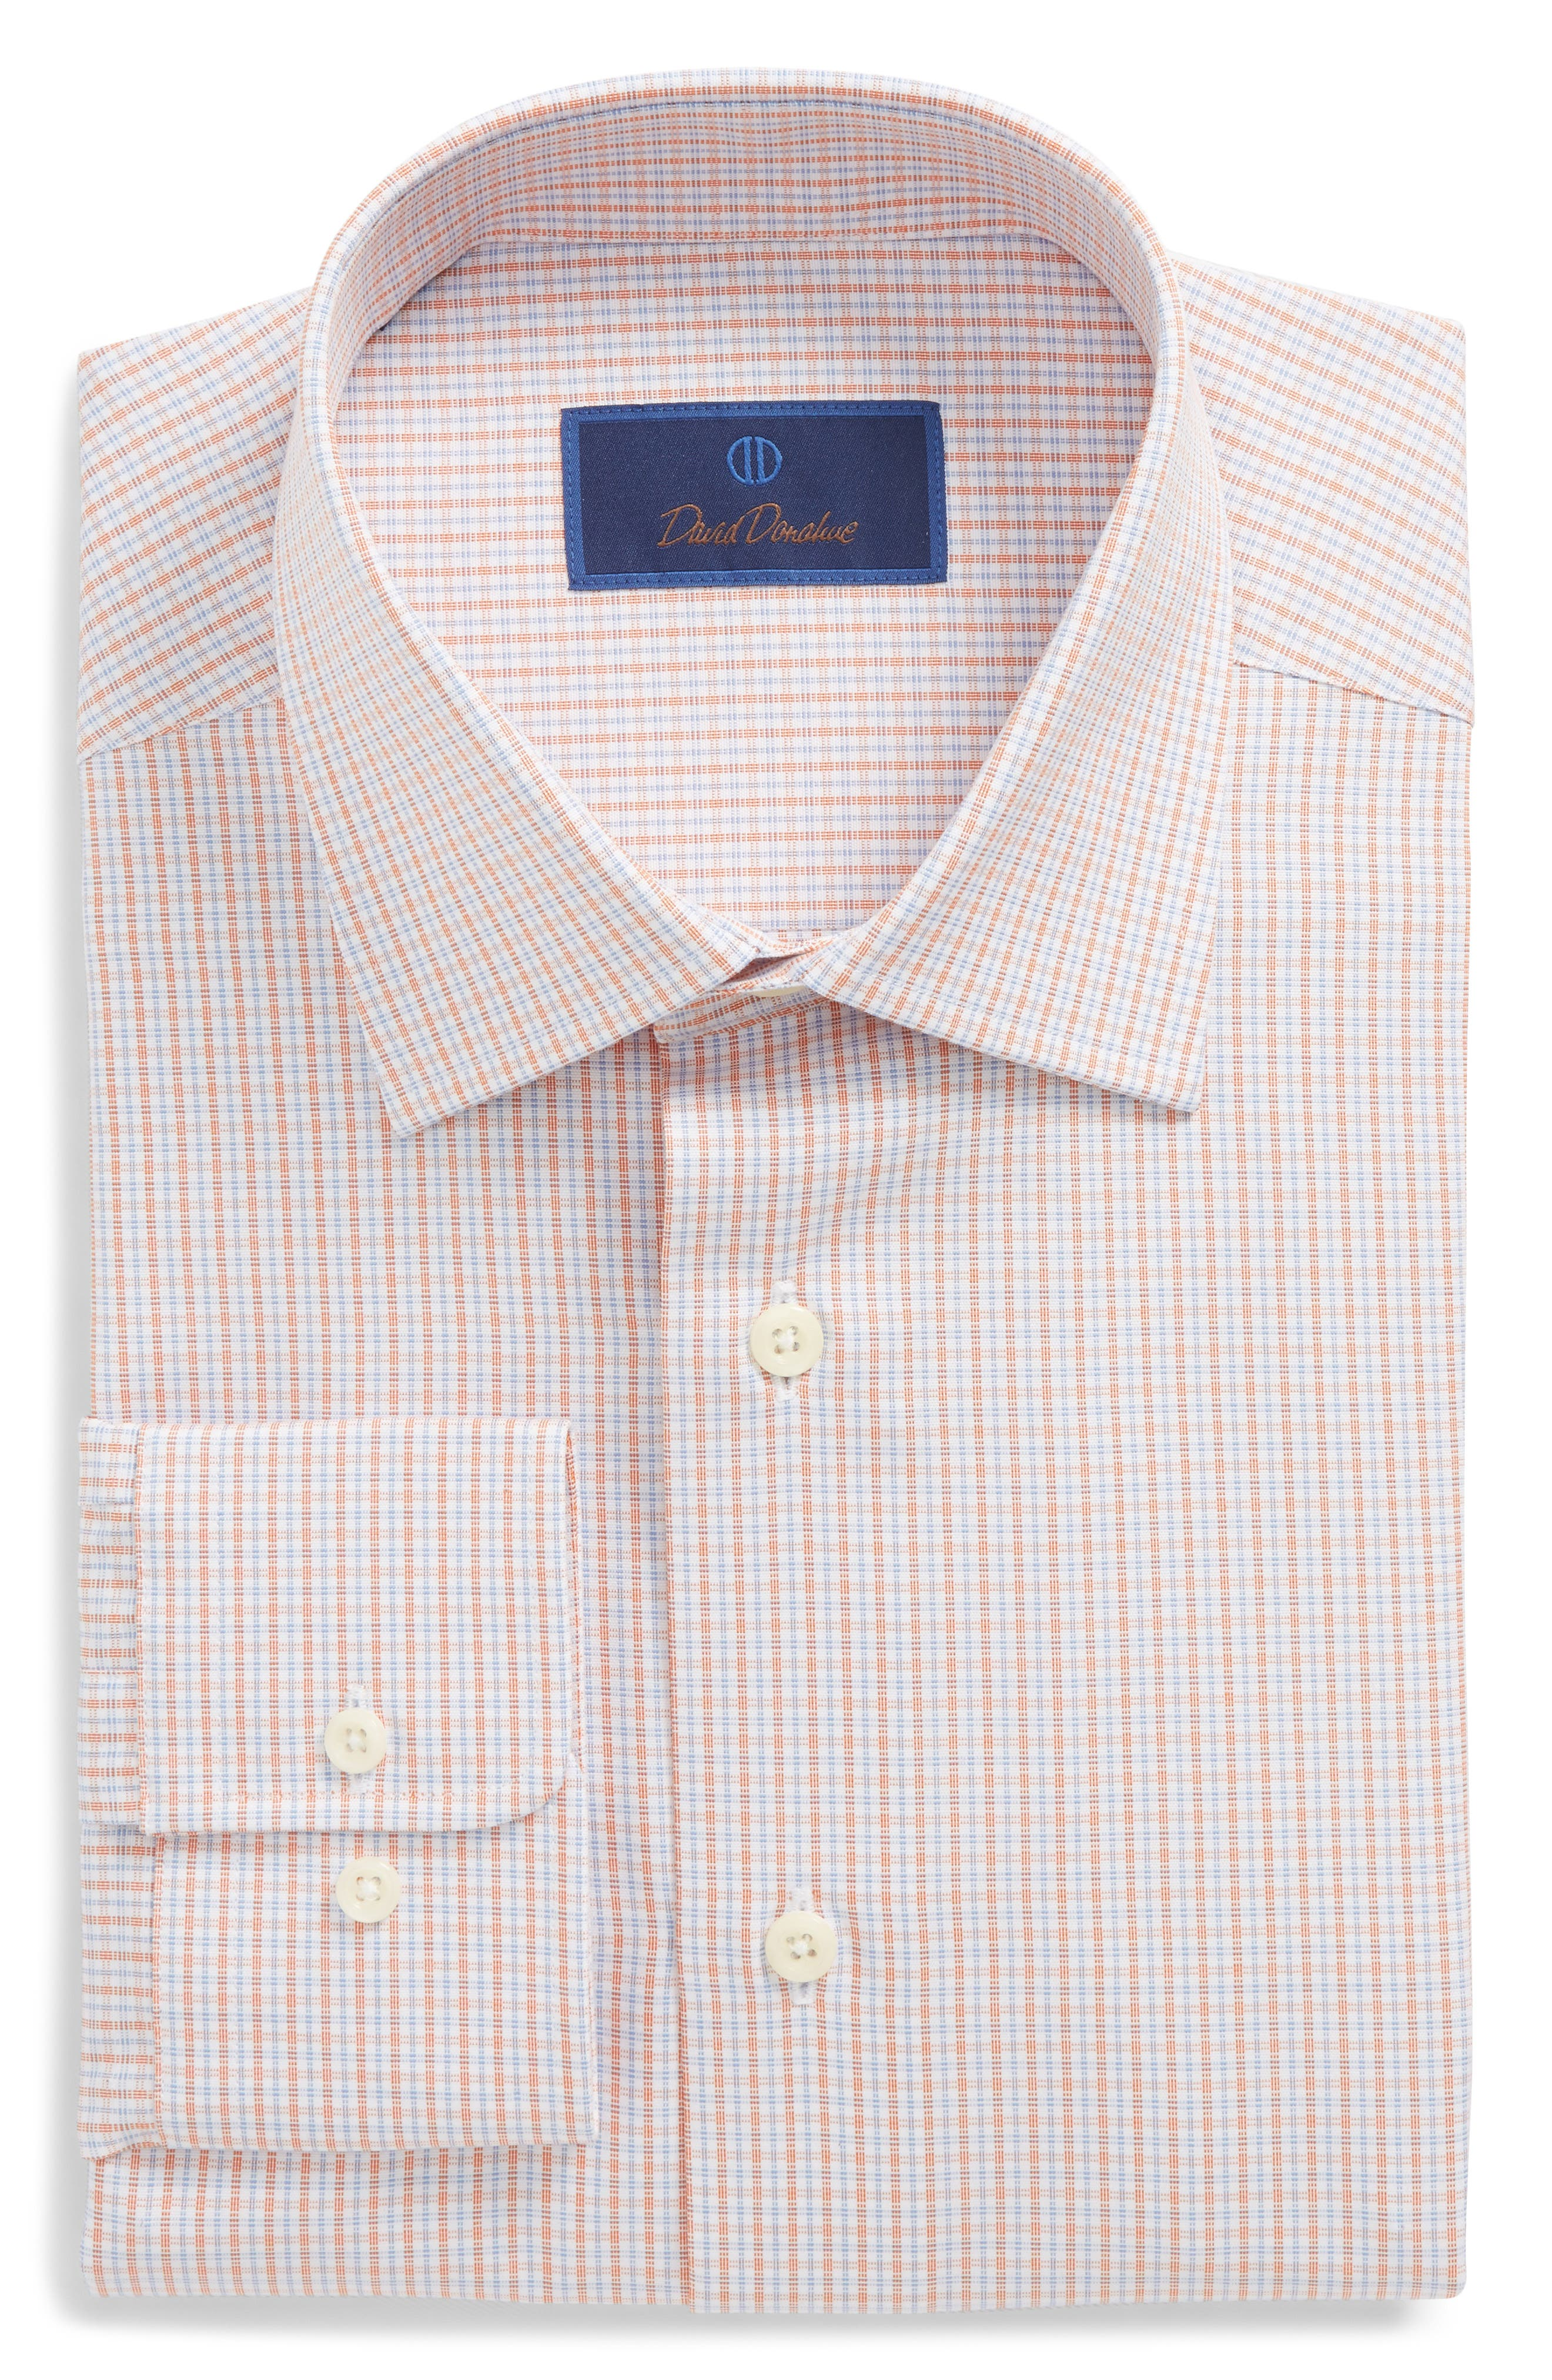 Regular Fit Check Dress Shirt,                         Main,                         color, Melon